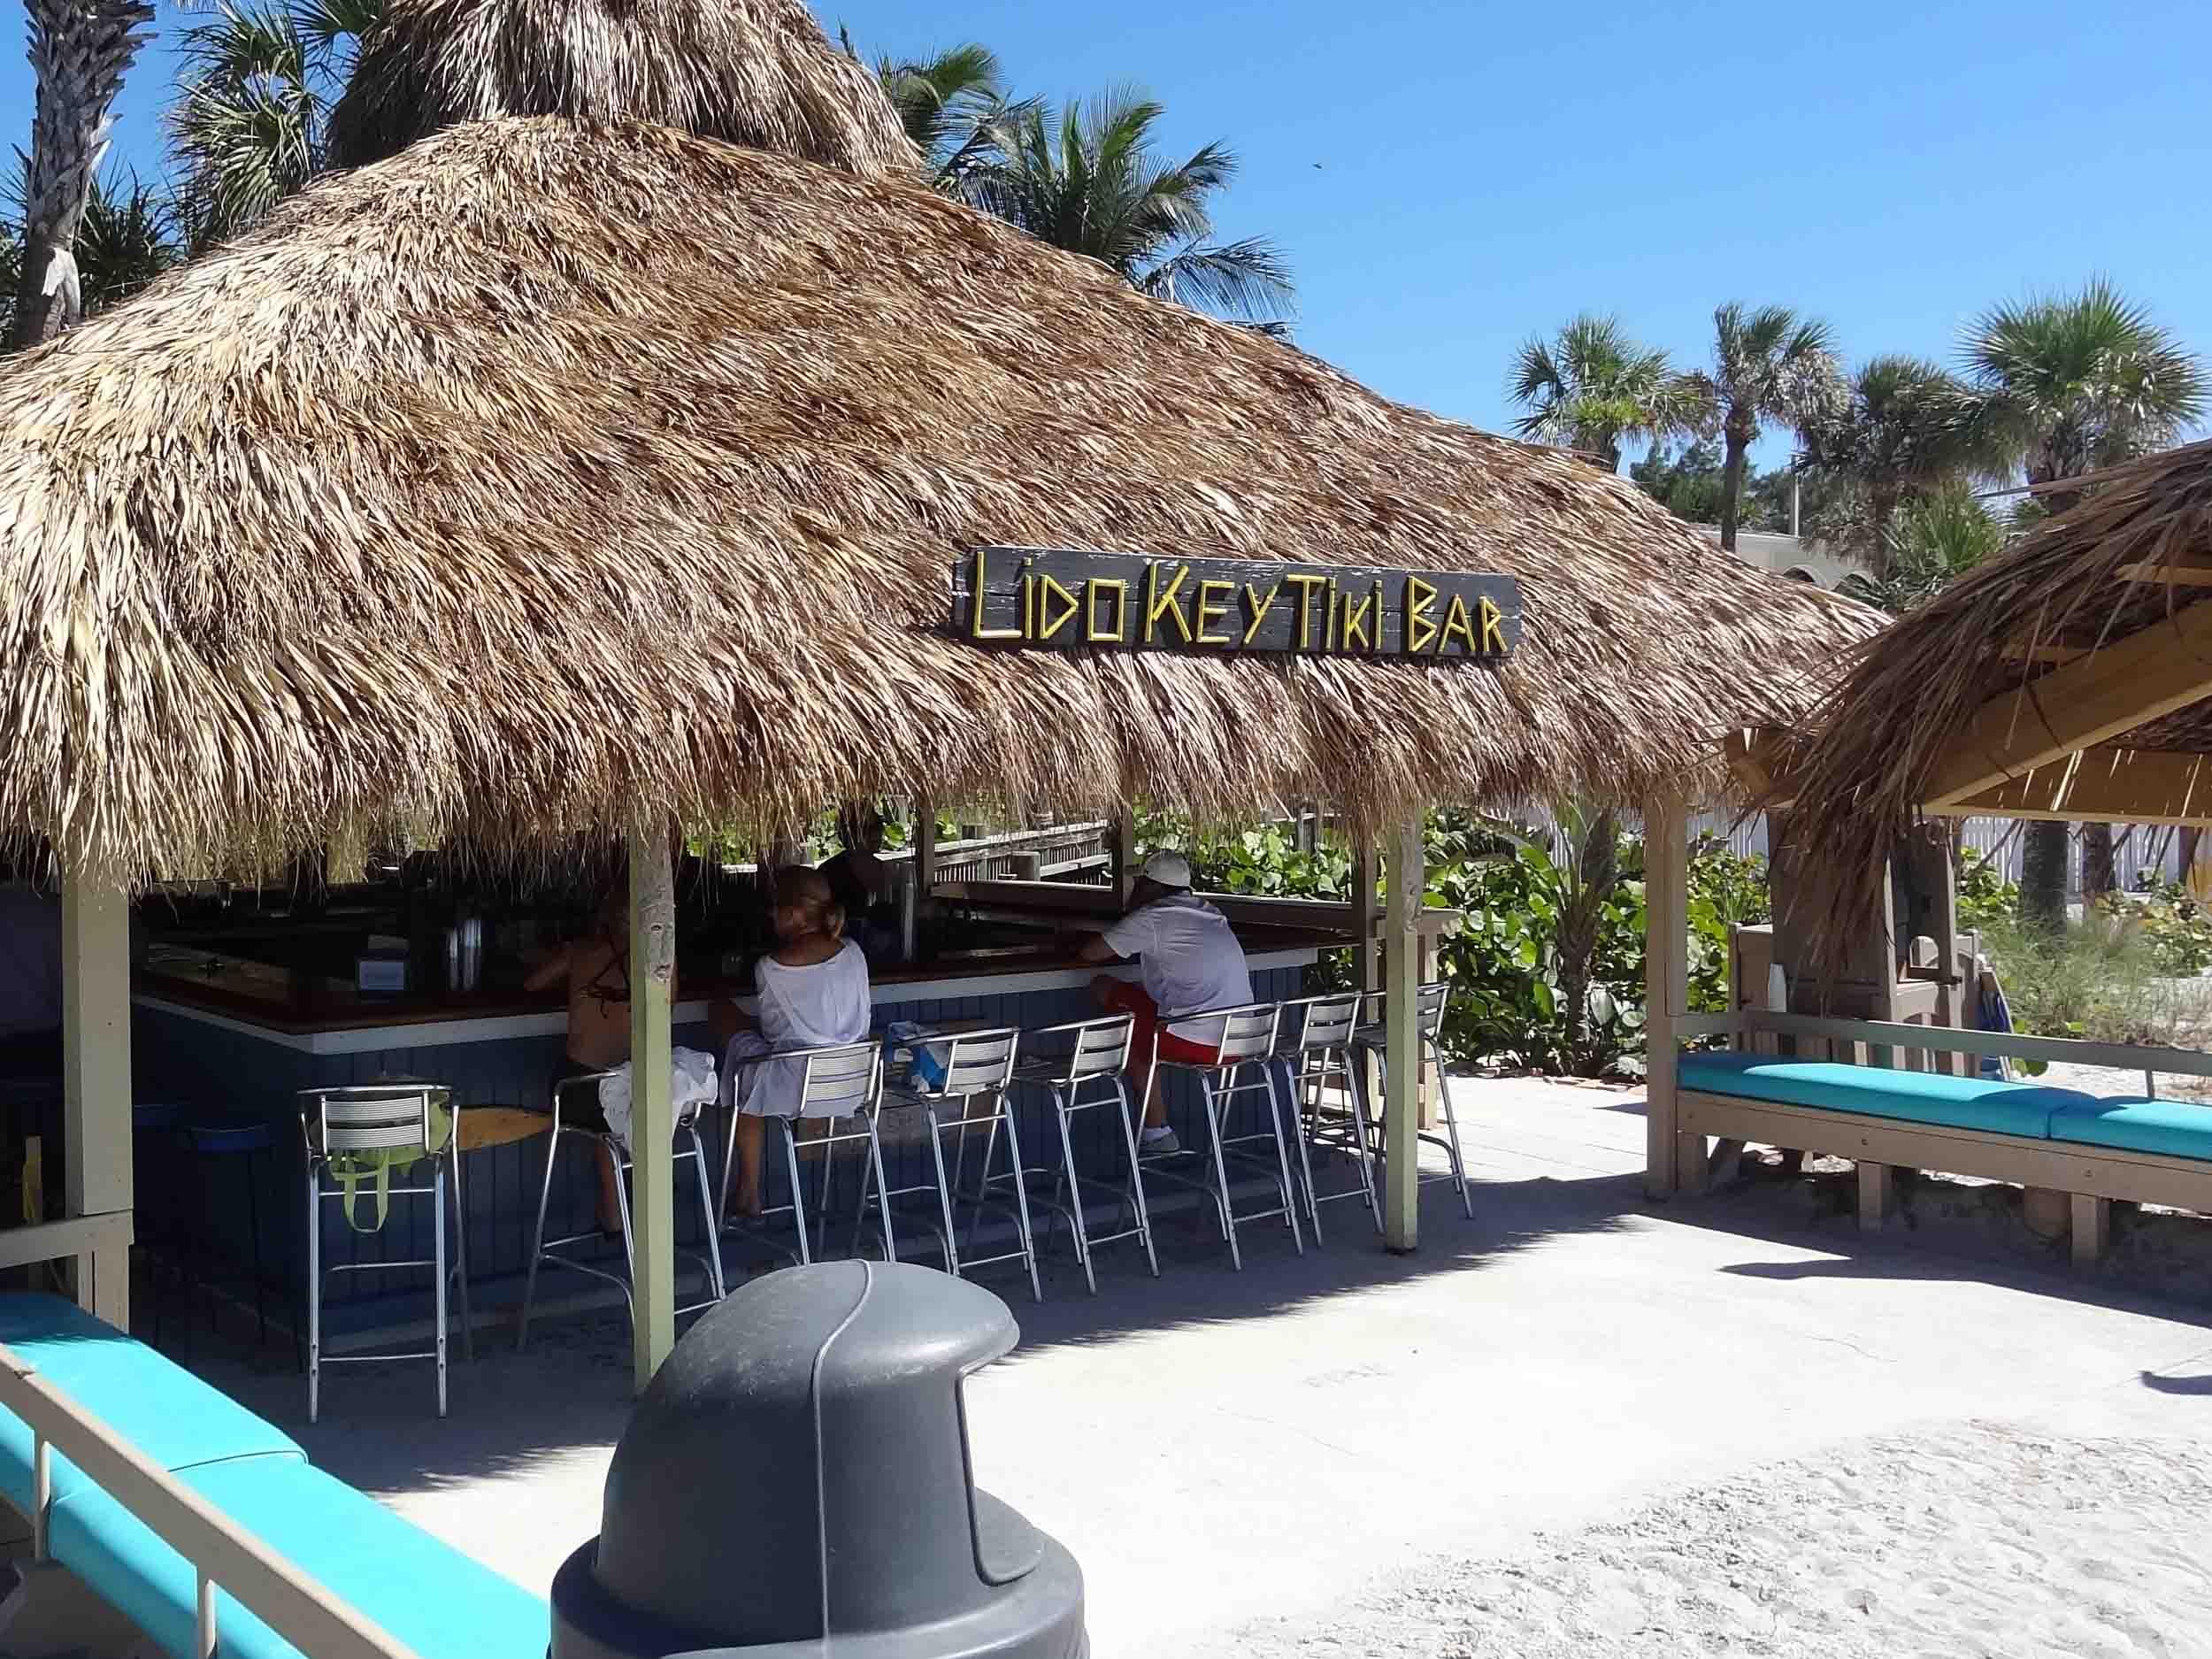 Lido Key Tiki Bar